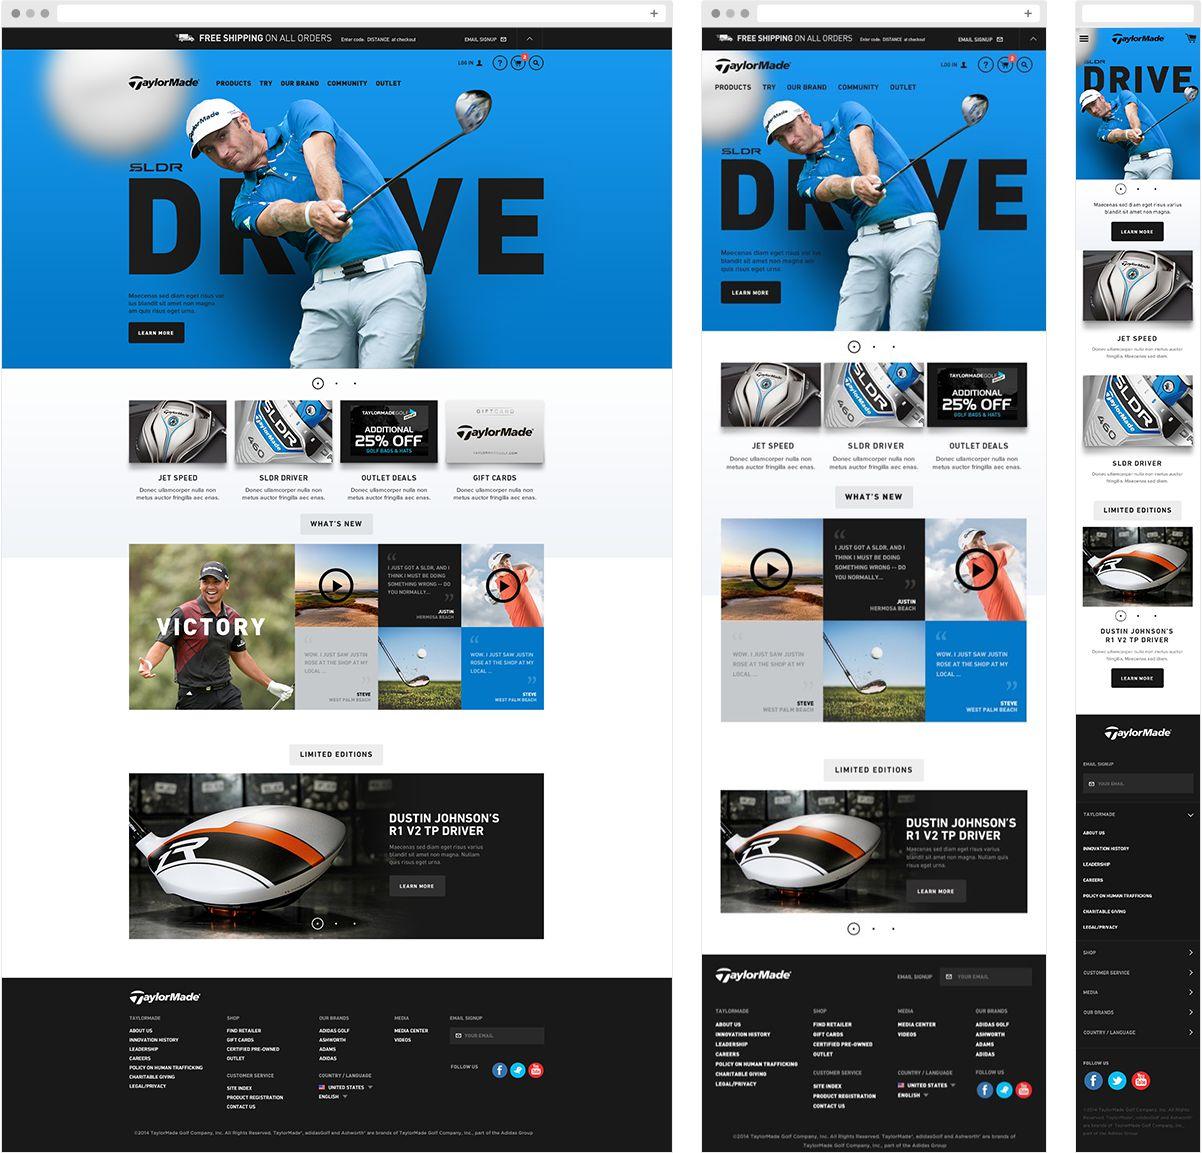 blitz_casestudy_taylormade_desktop_image01.jpg